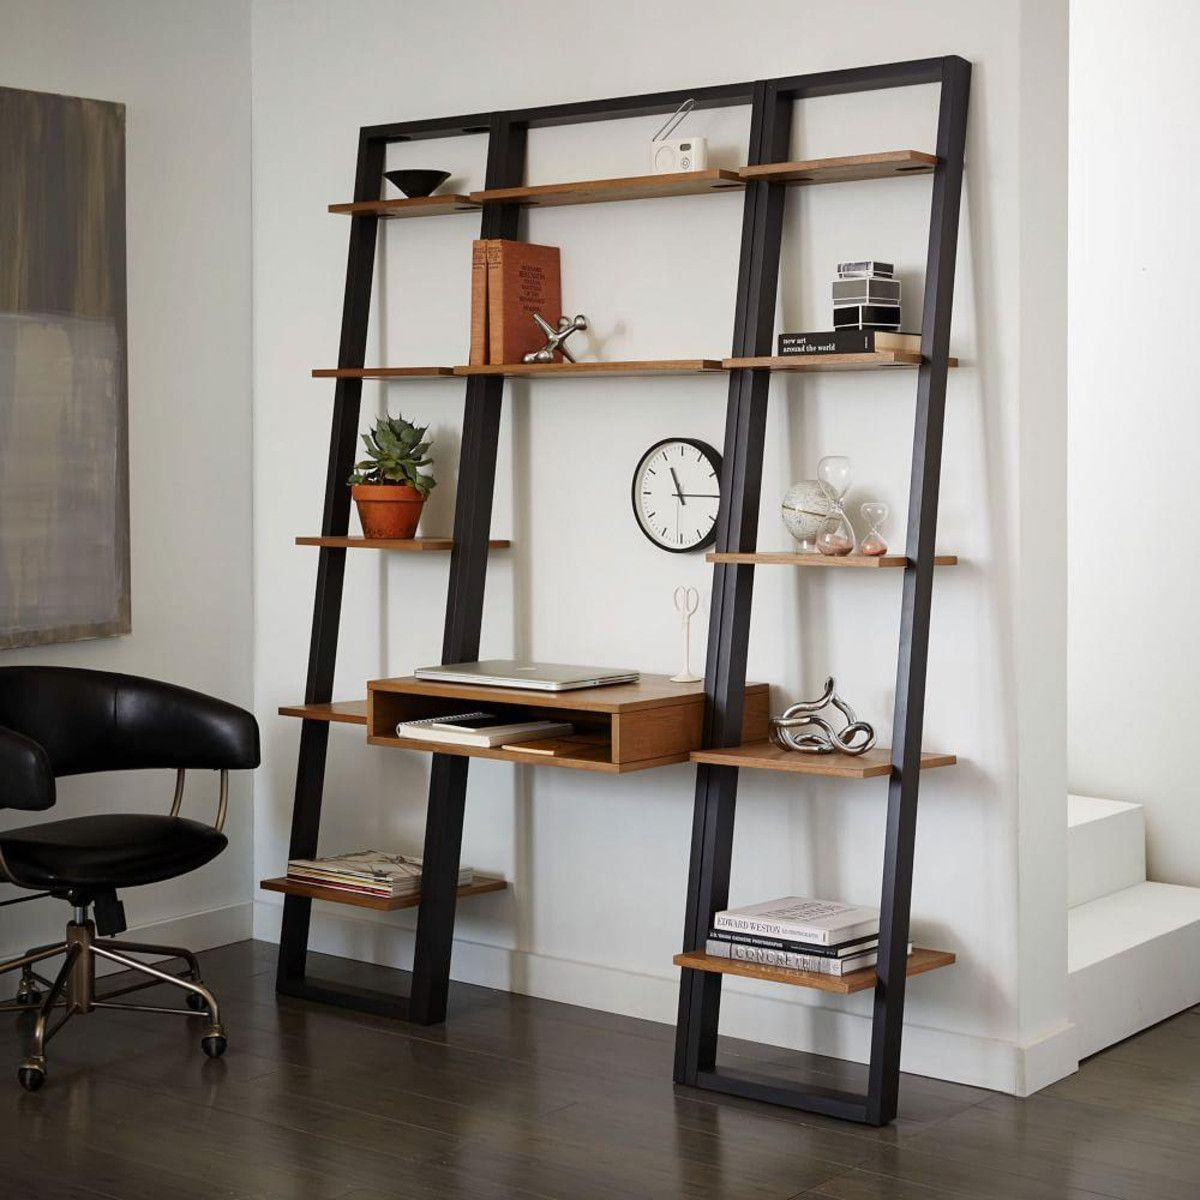 Ladder Shelf Storage Leaning Wall Desk + 2 Narrow Shelves